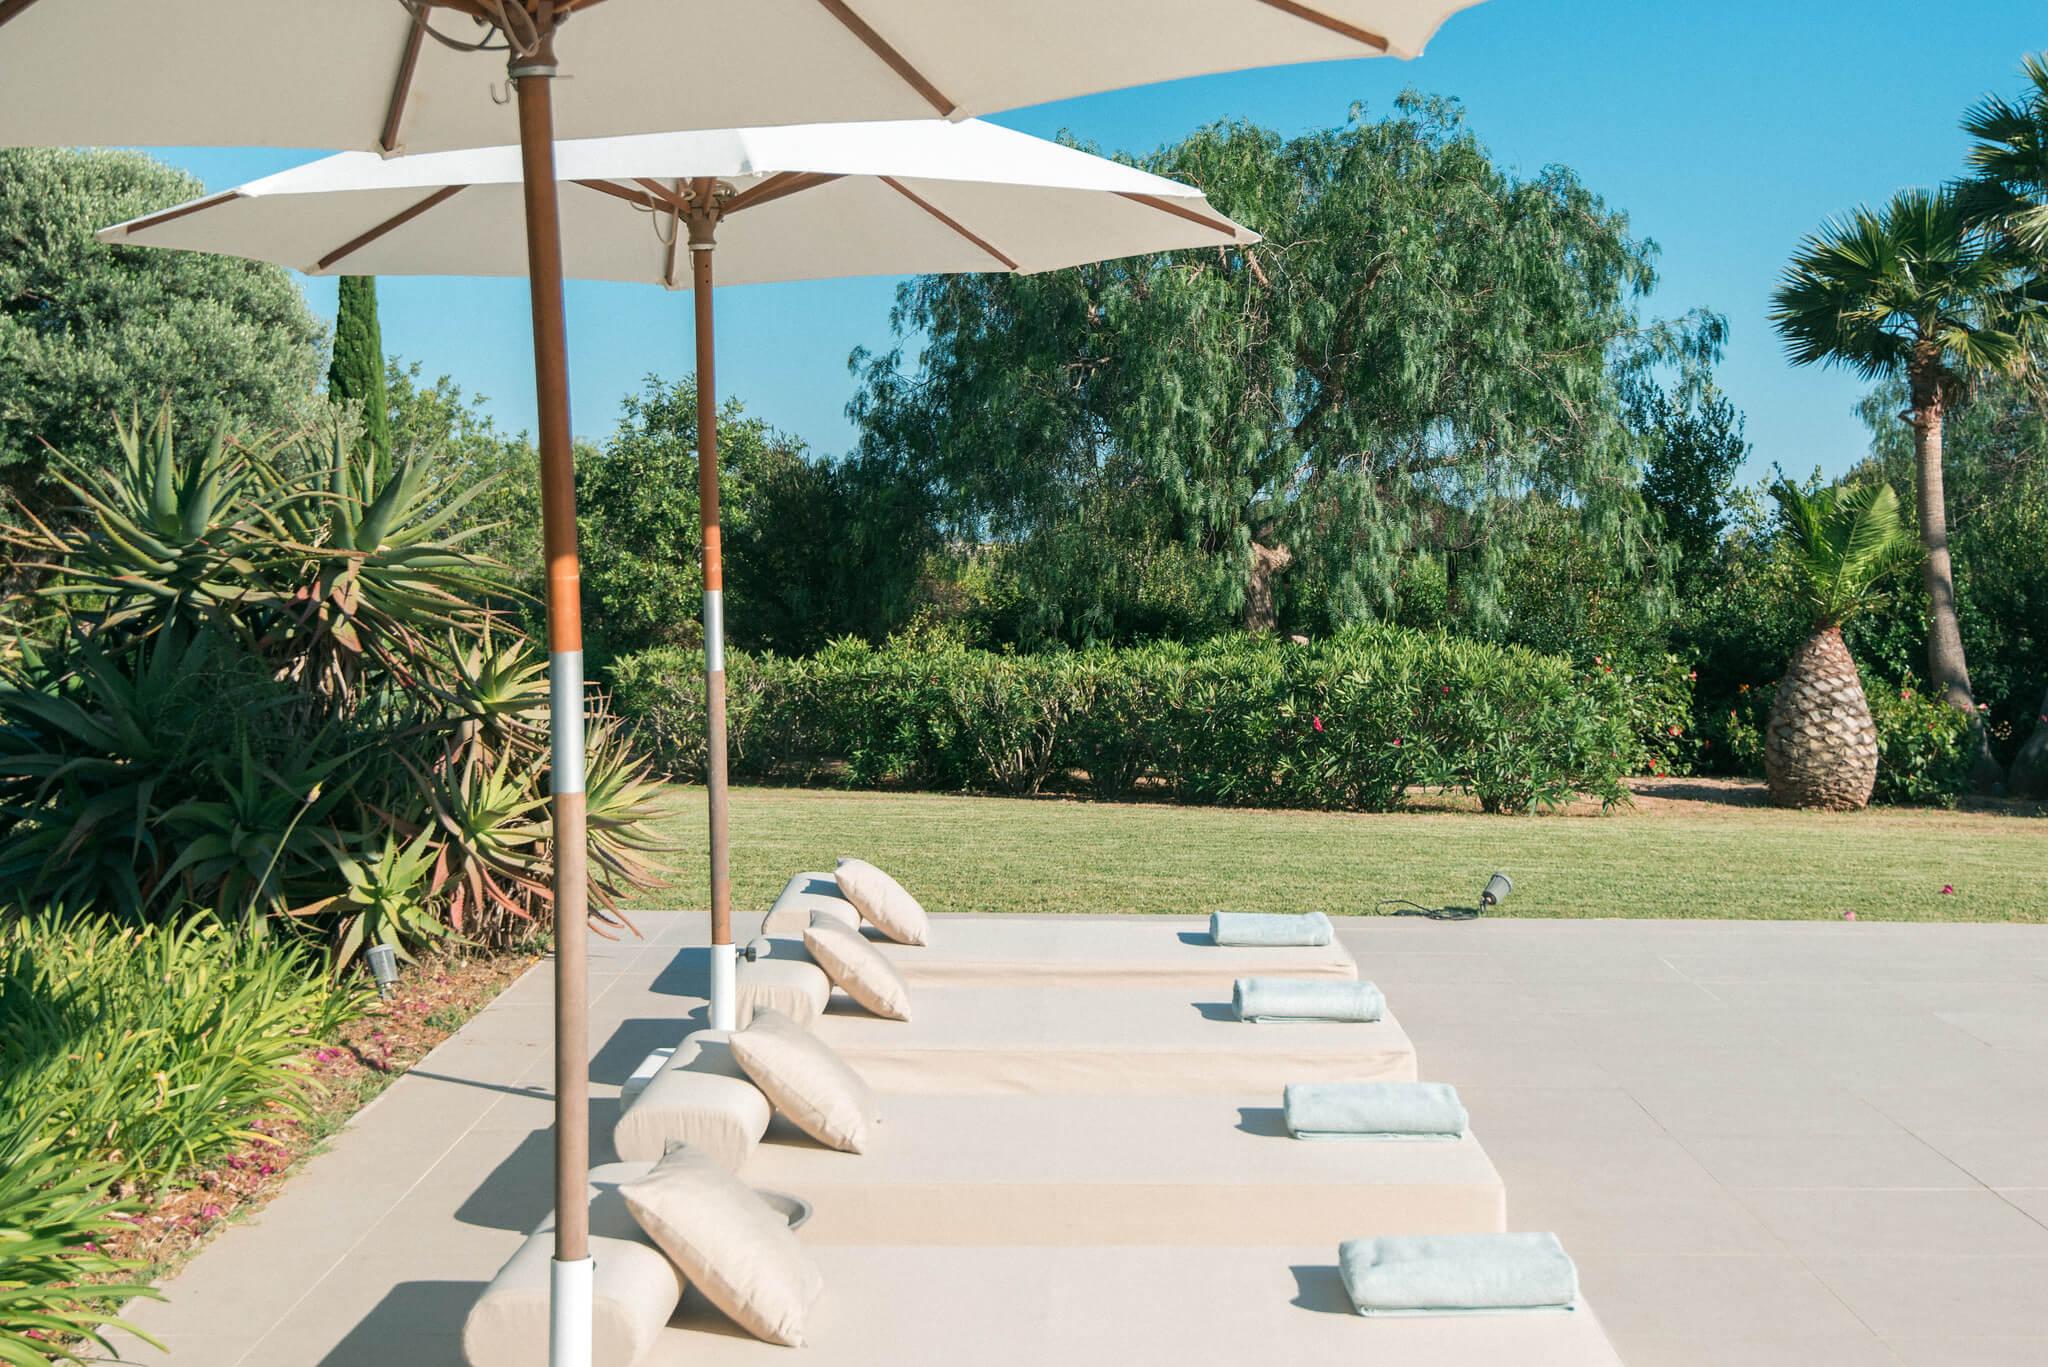 https://www.white-ibiza.com/wp-content/uploads/2020/06/white-ibiza-villas-casa-odette-exterior-sunloungers.jpg